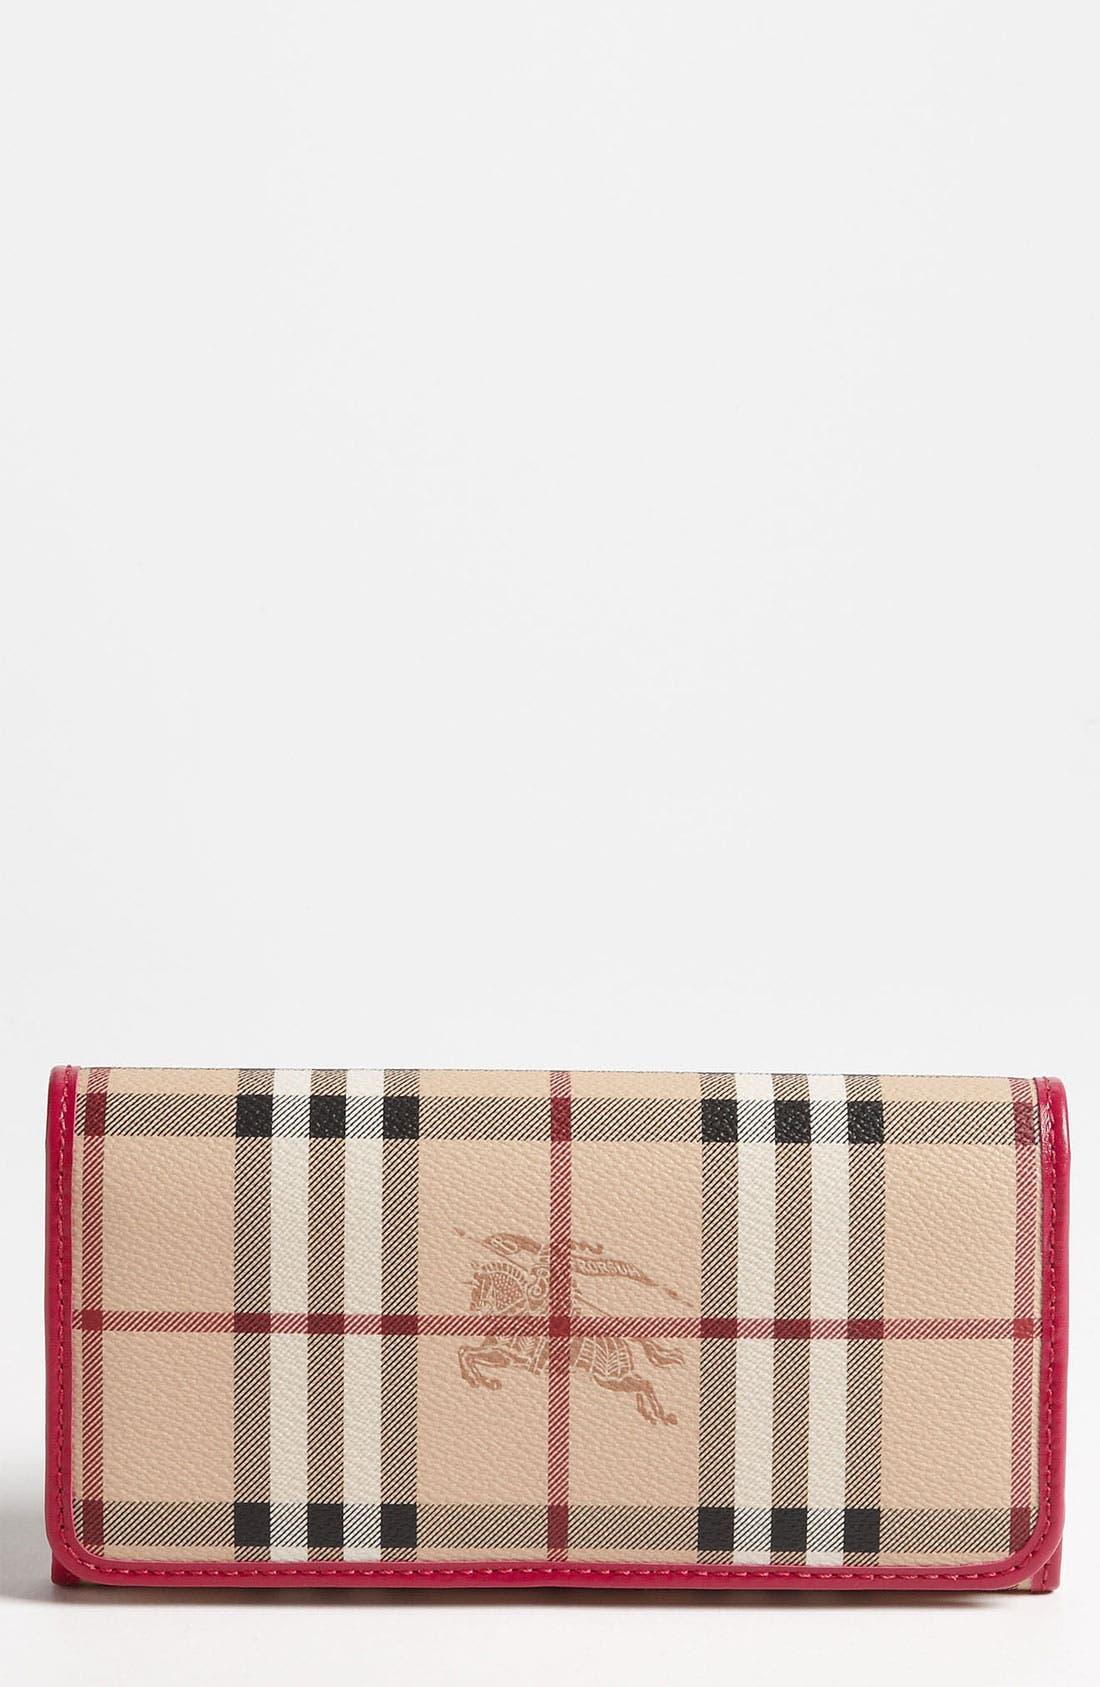 Alternate Image 1 Selected - Burberry 'Haymarket Check' Flap Wallet